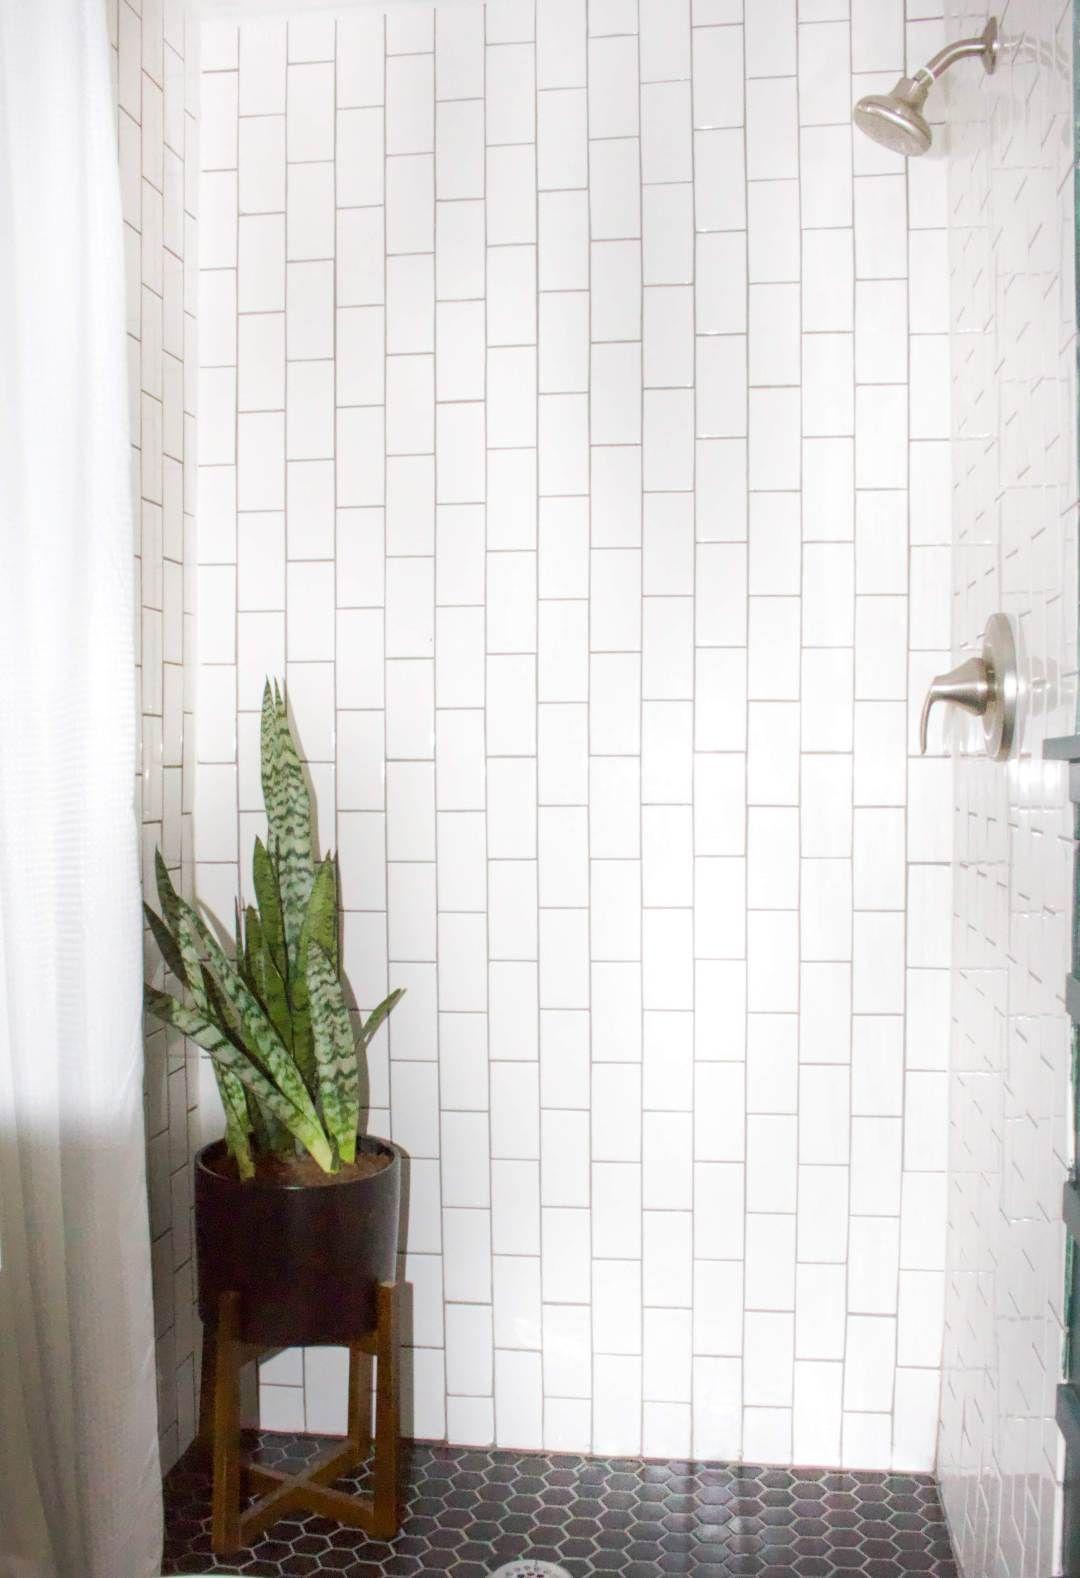 Diy Shower Tiling Made Easy Honey Built Home In 2020 Diy Tile Shower Shower Tile Diy Shower